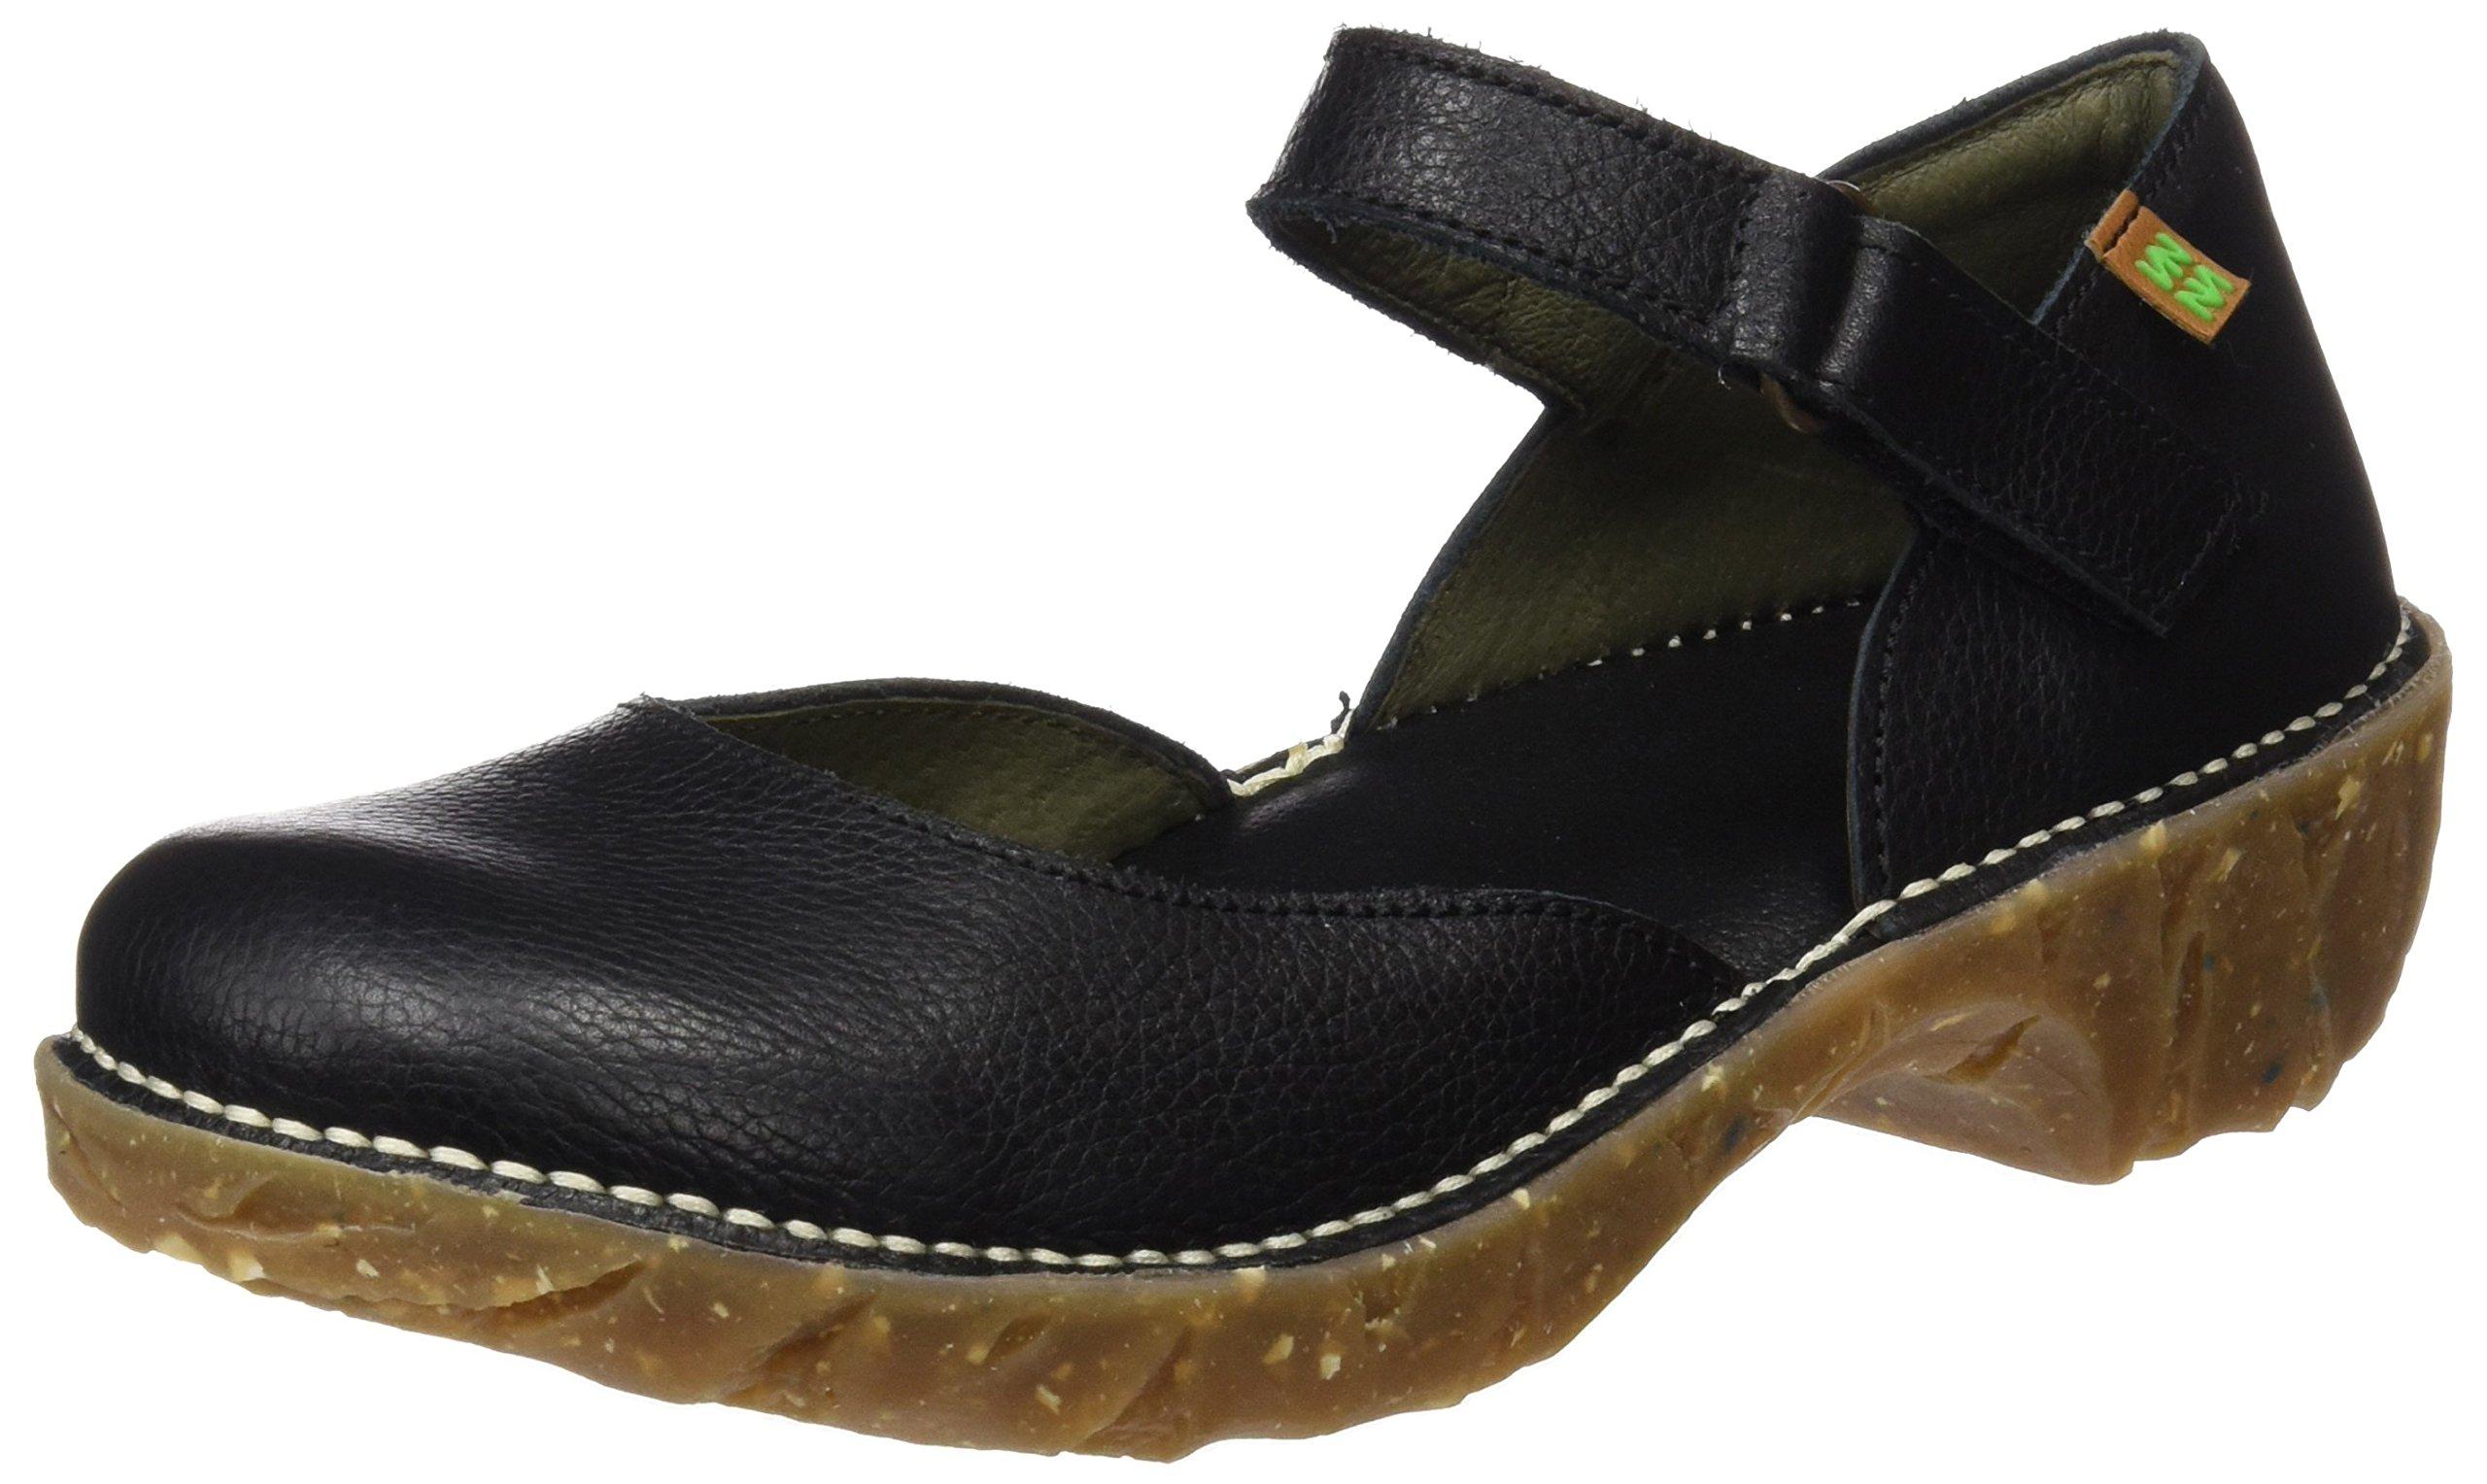 El Naturalista Women's Yggdrasil Ng50 Slipper, Black, 38 EU/7.5 M US